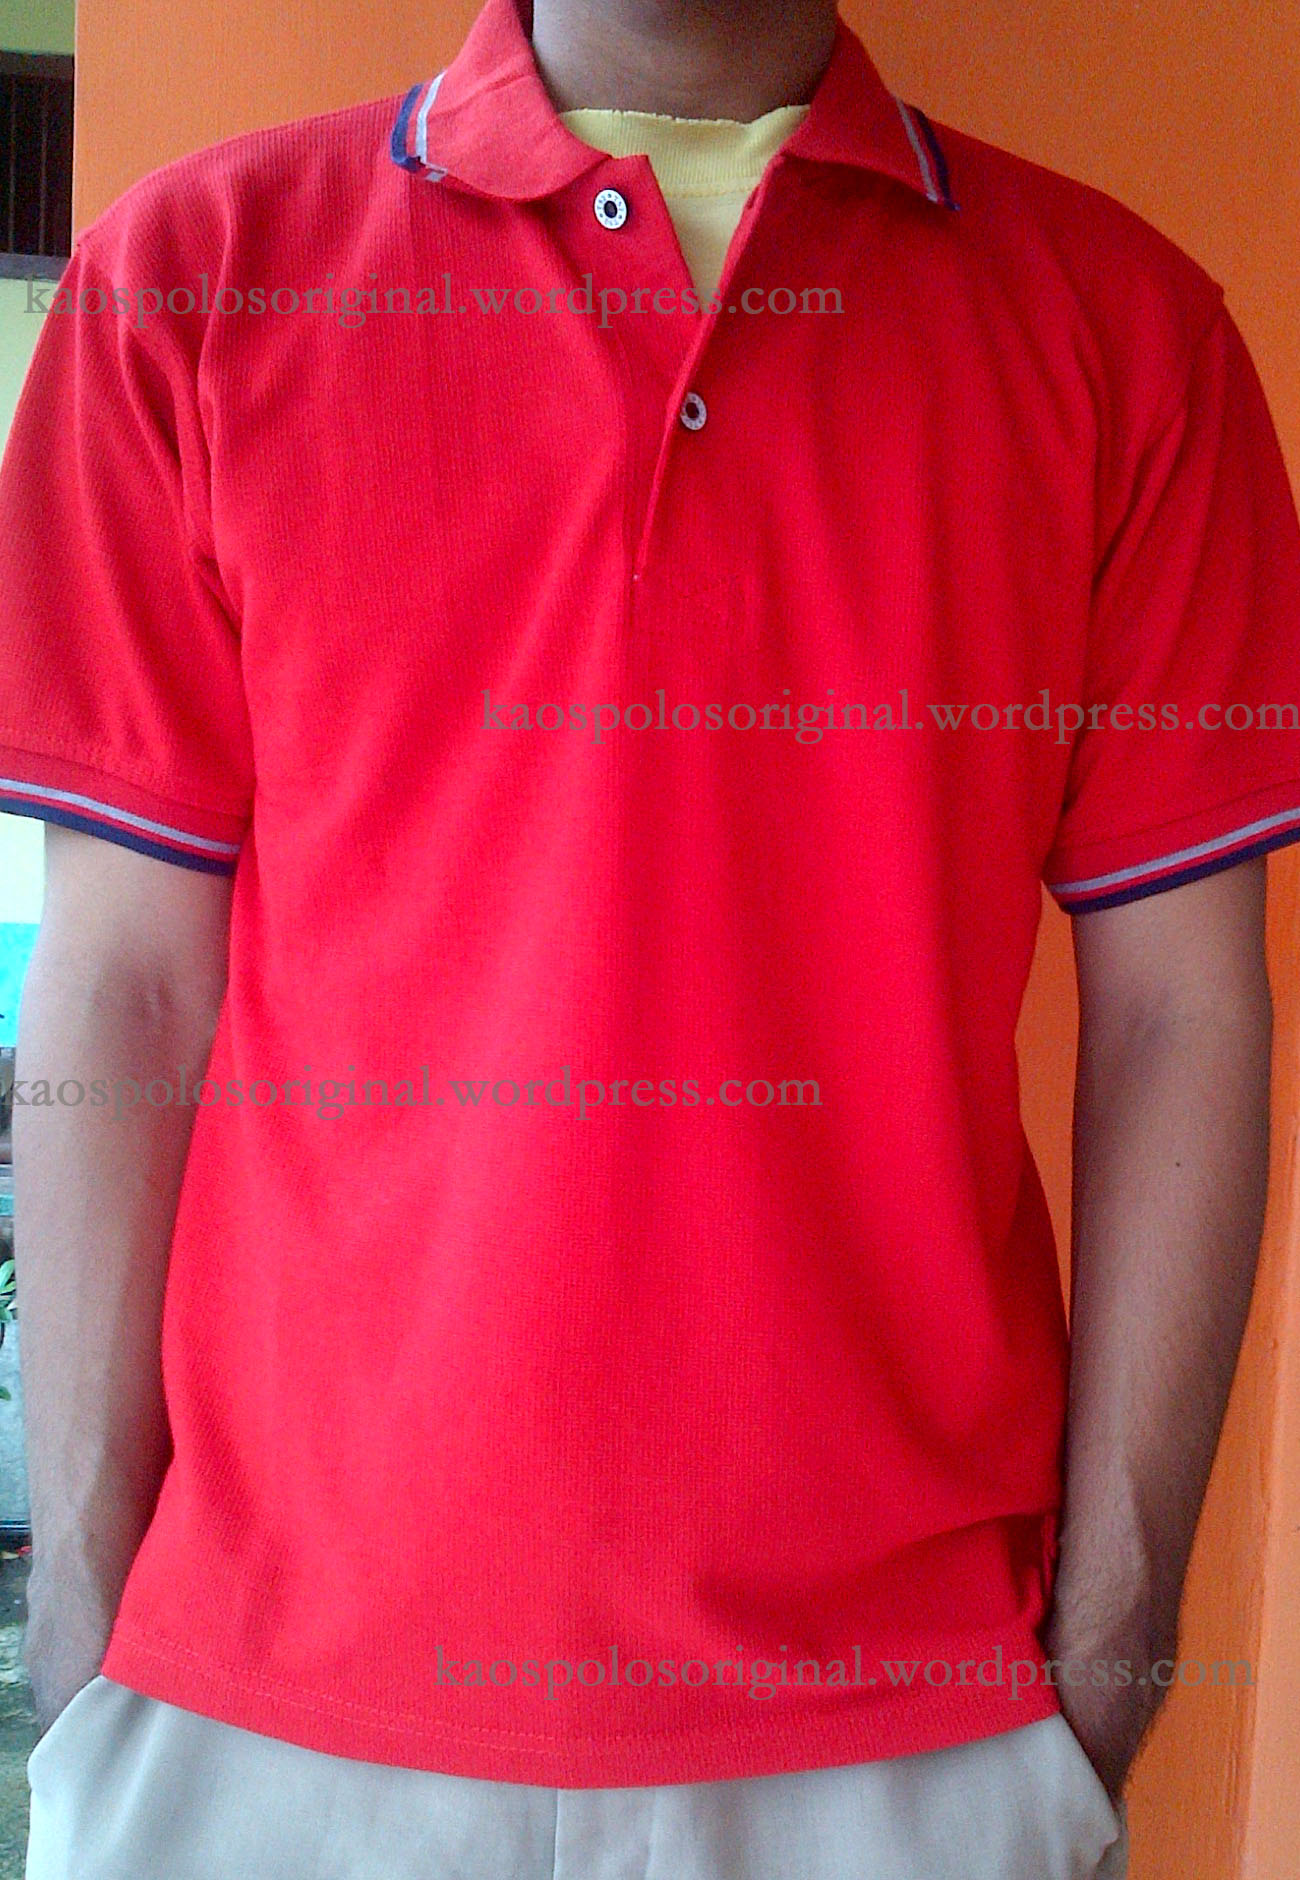 Jual Kaos Anak Murah Jakarta Harga Polo Shirt Surabaya